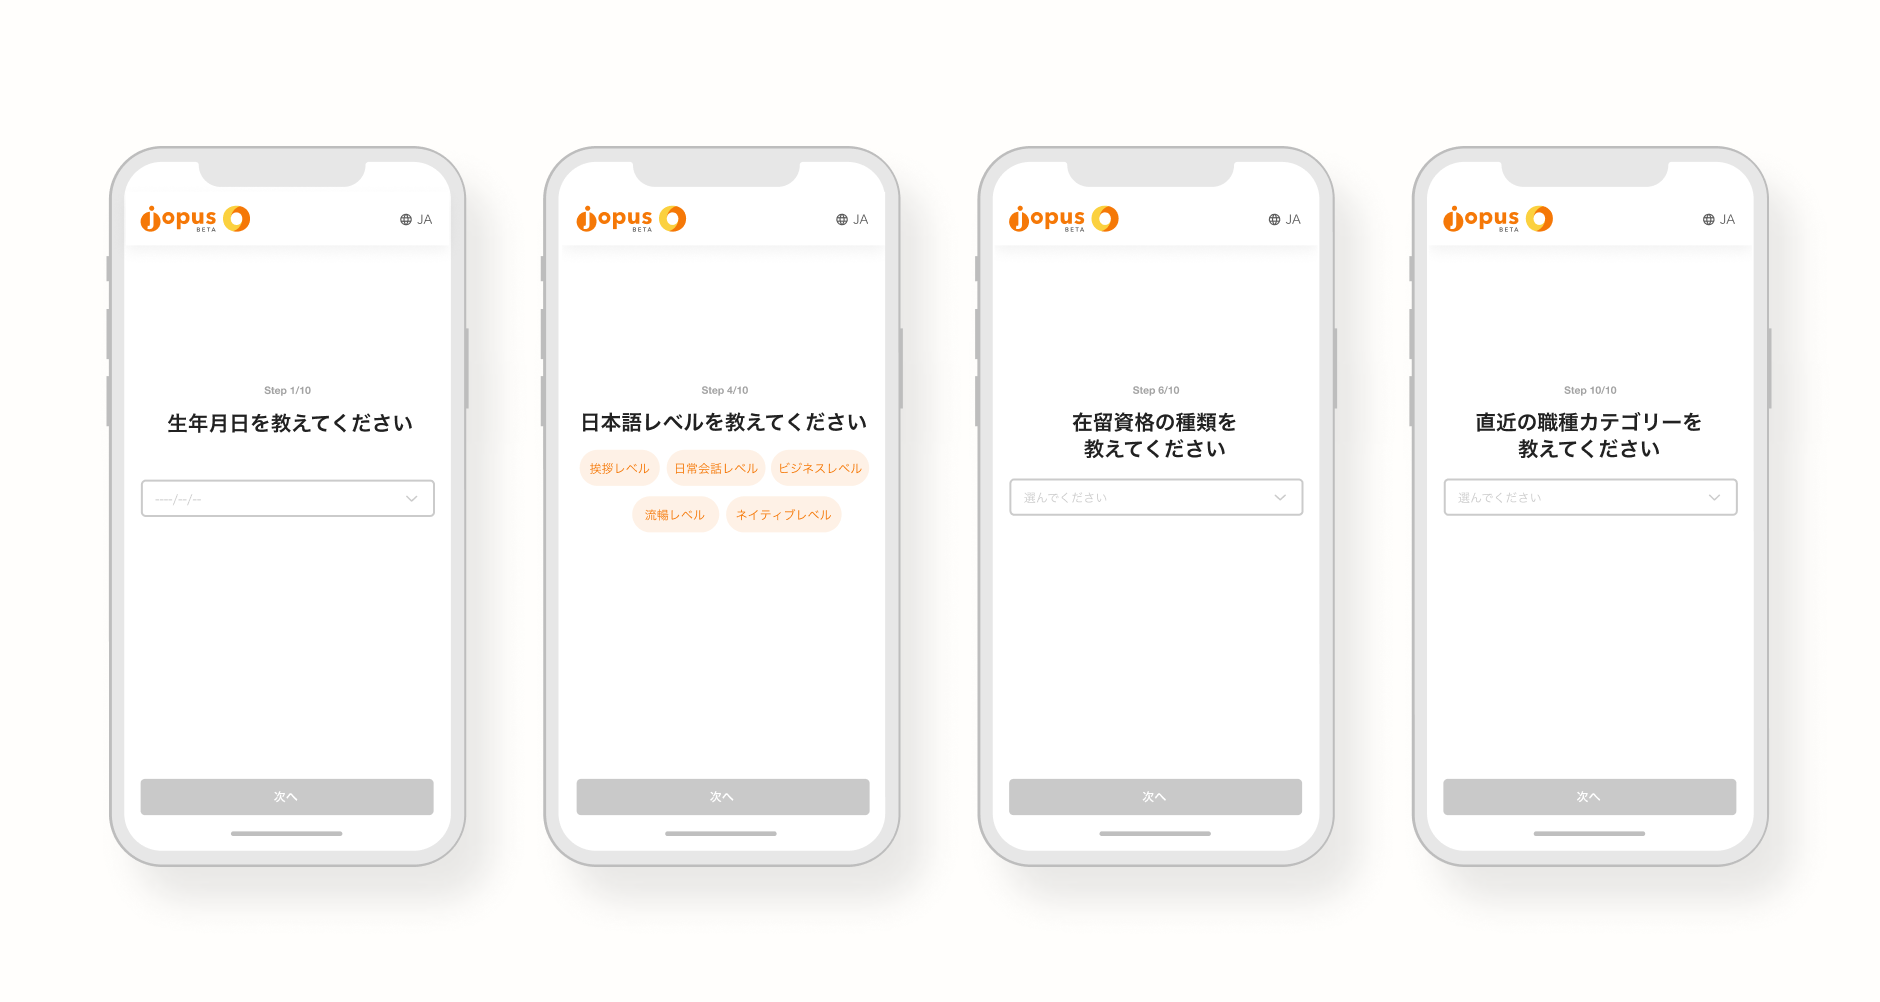 Jopus Connecter 会員登録UI画面